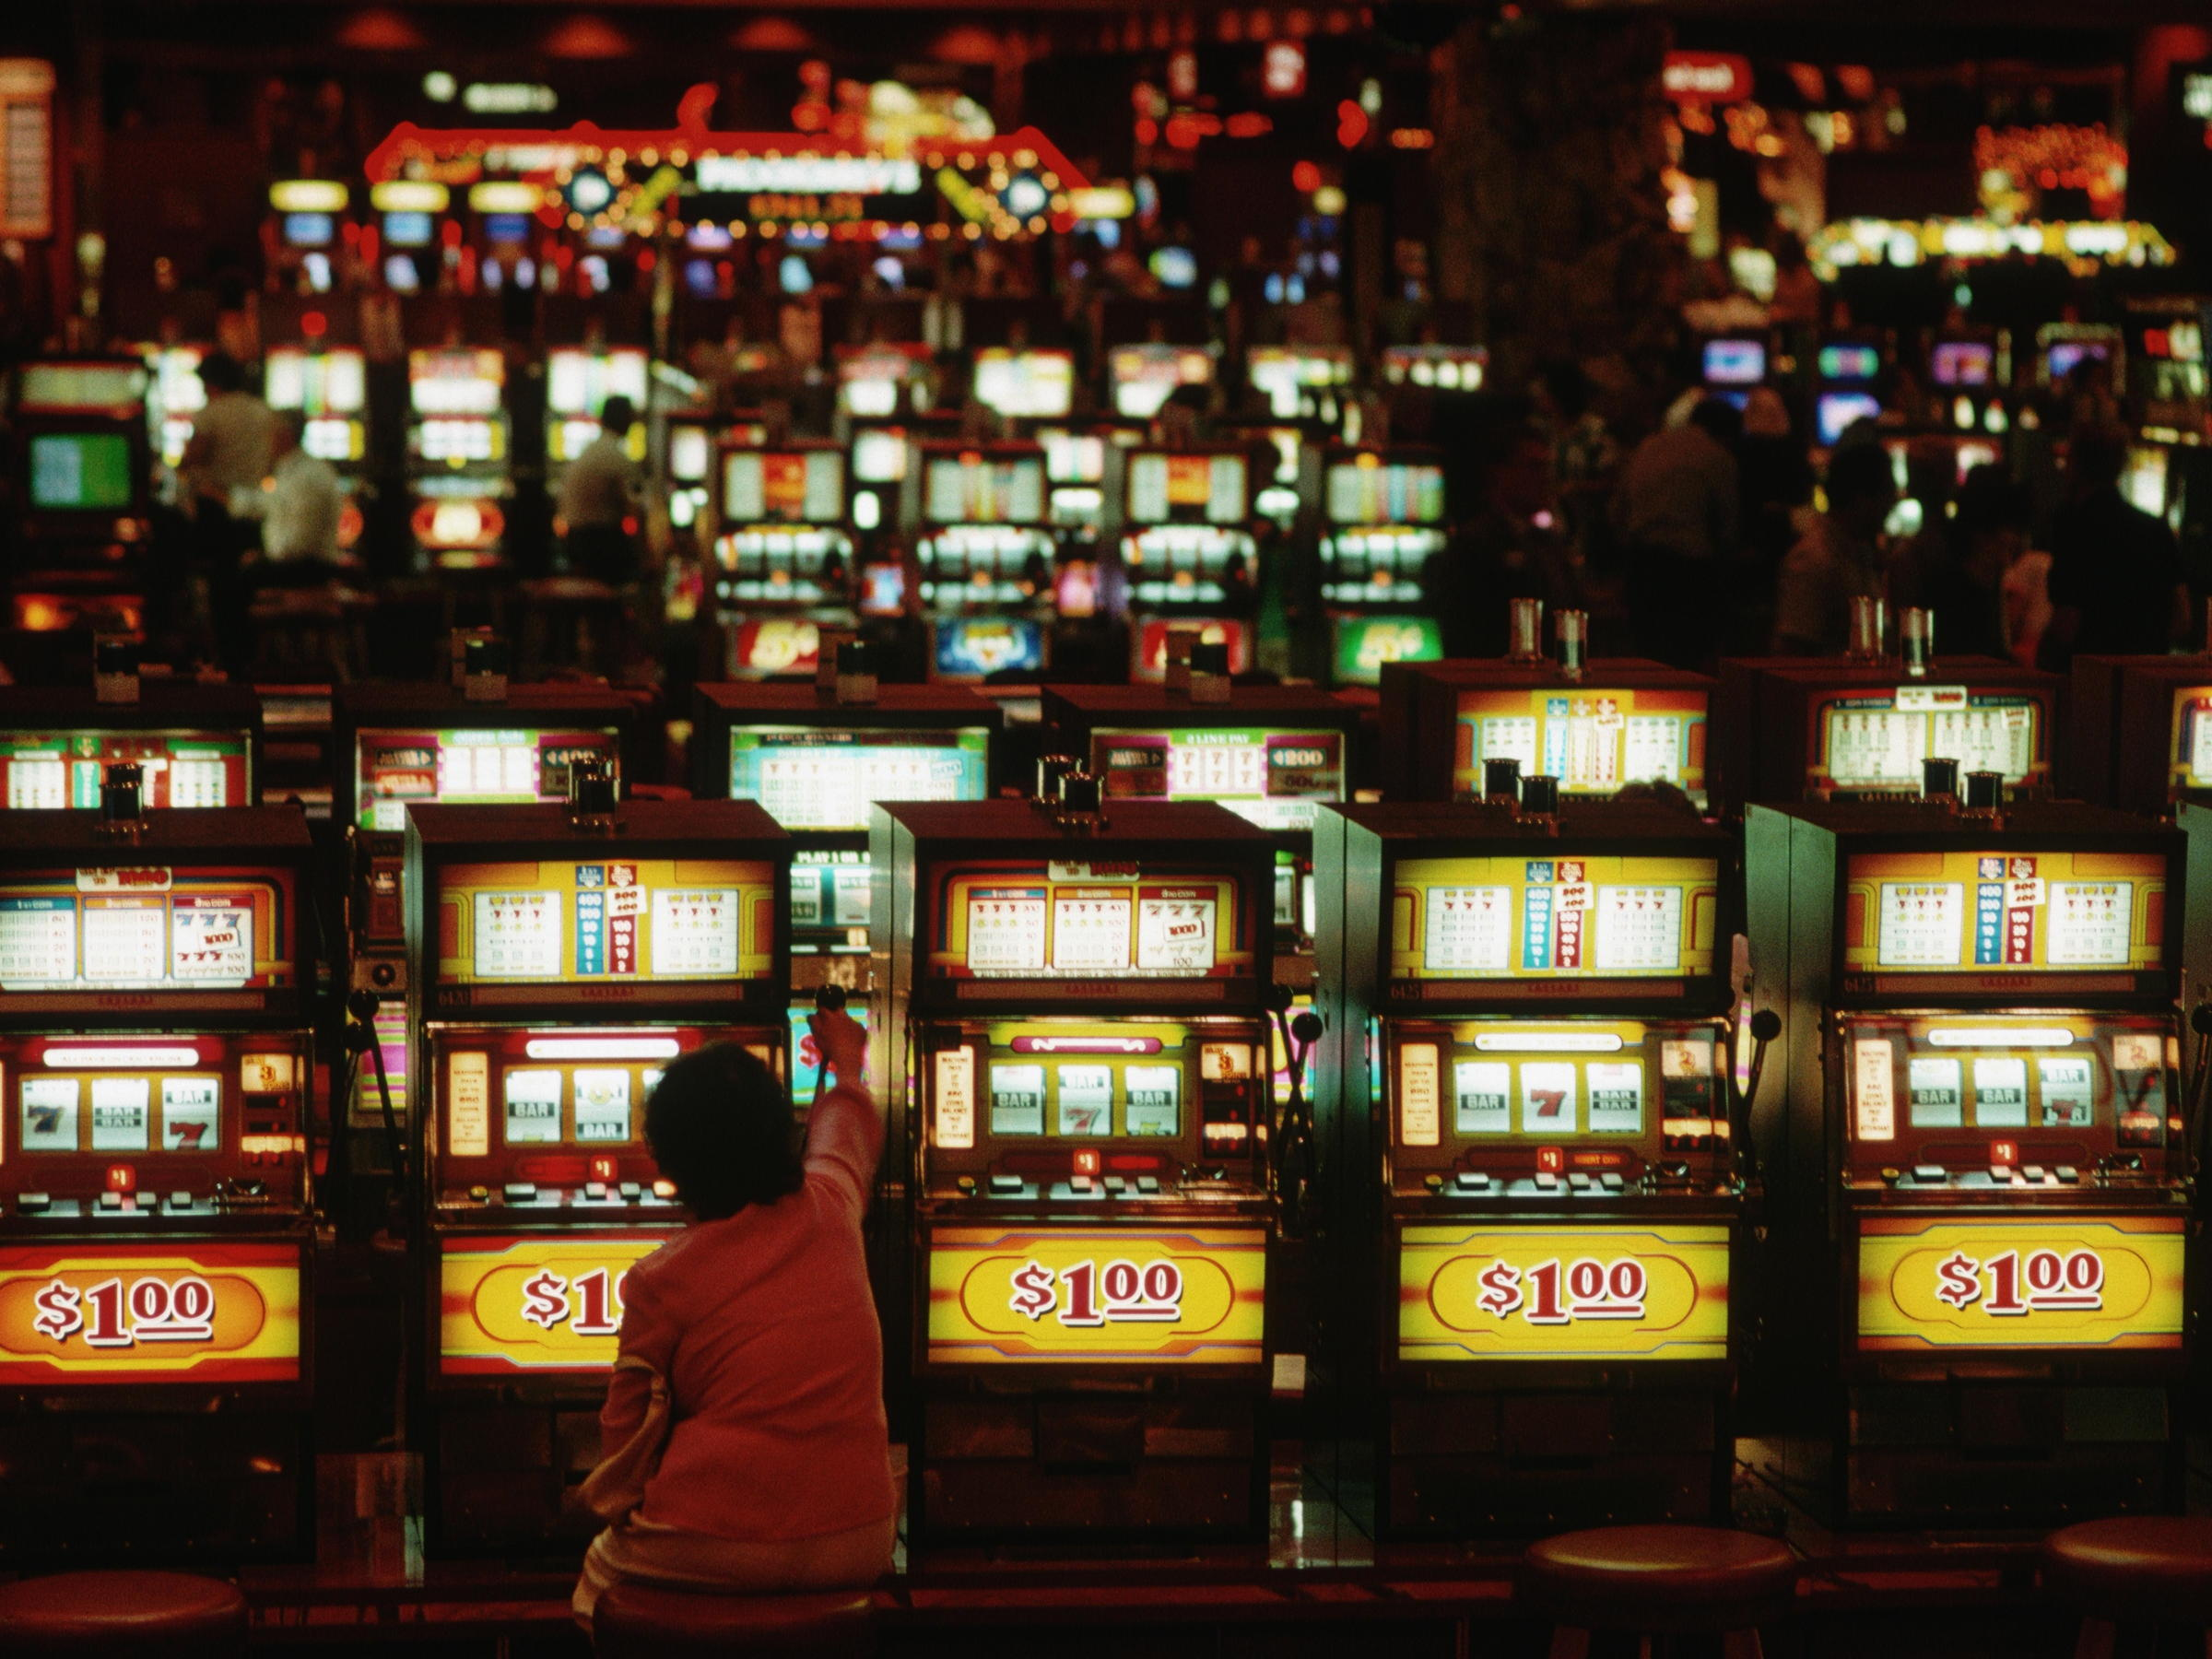 Eur 215 Free Chip Casino في ديزرت نايتس